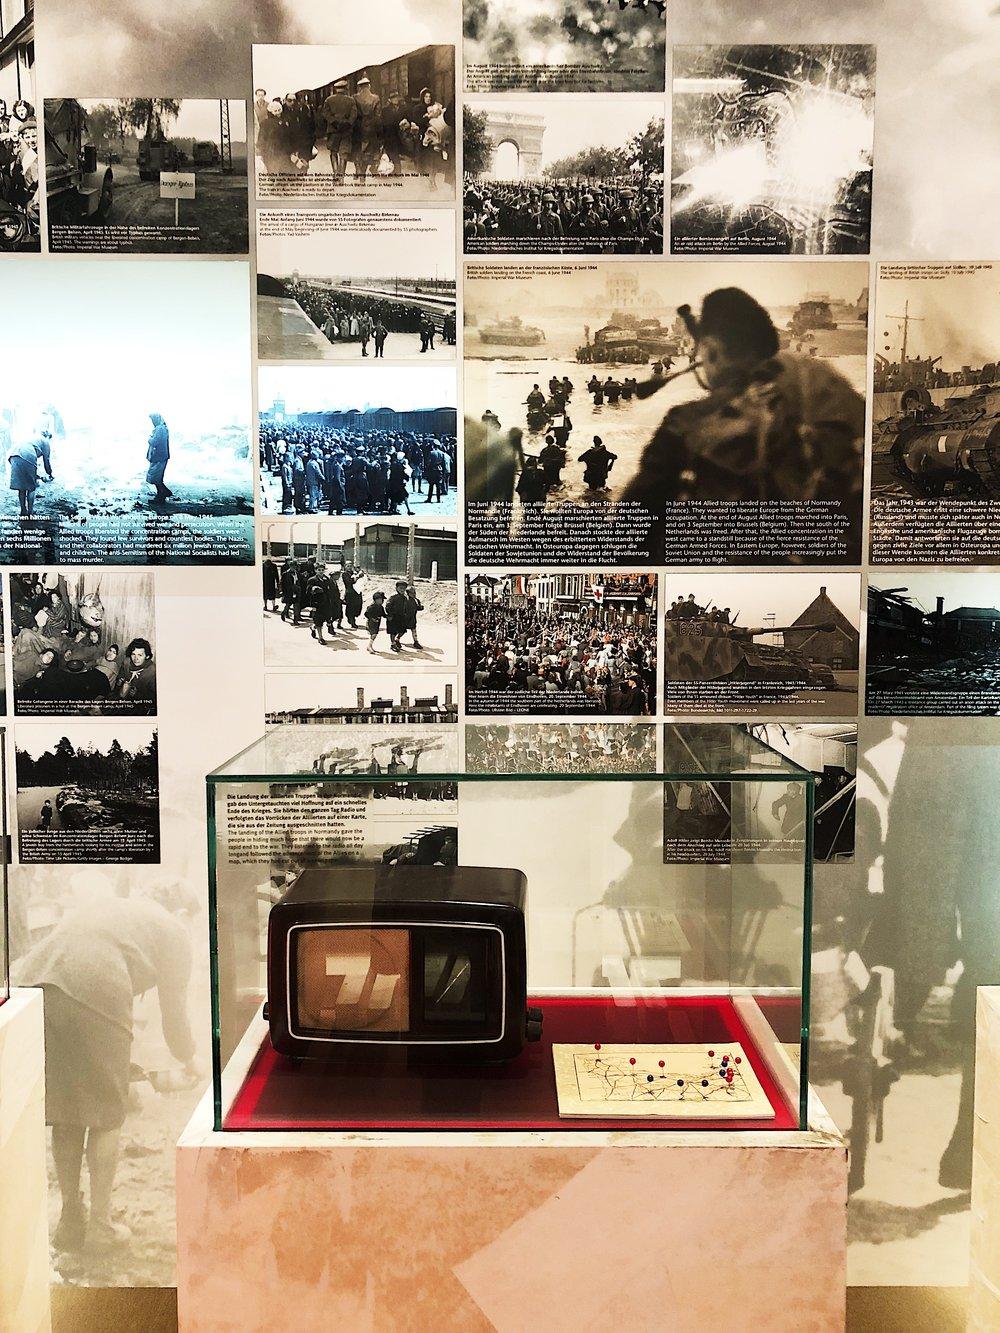 anne frank museum berlin travel